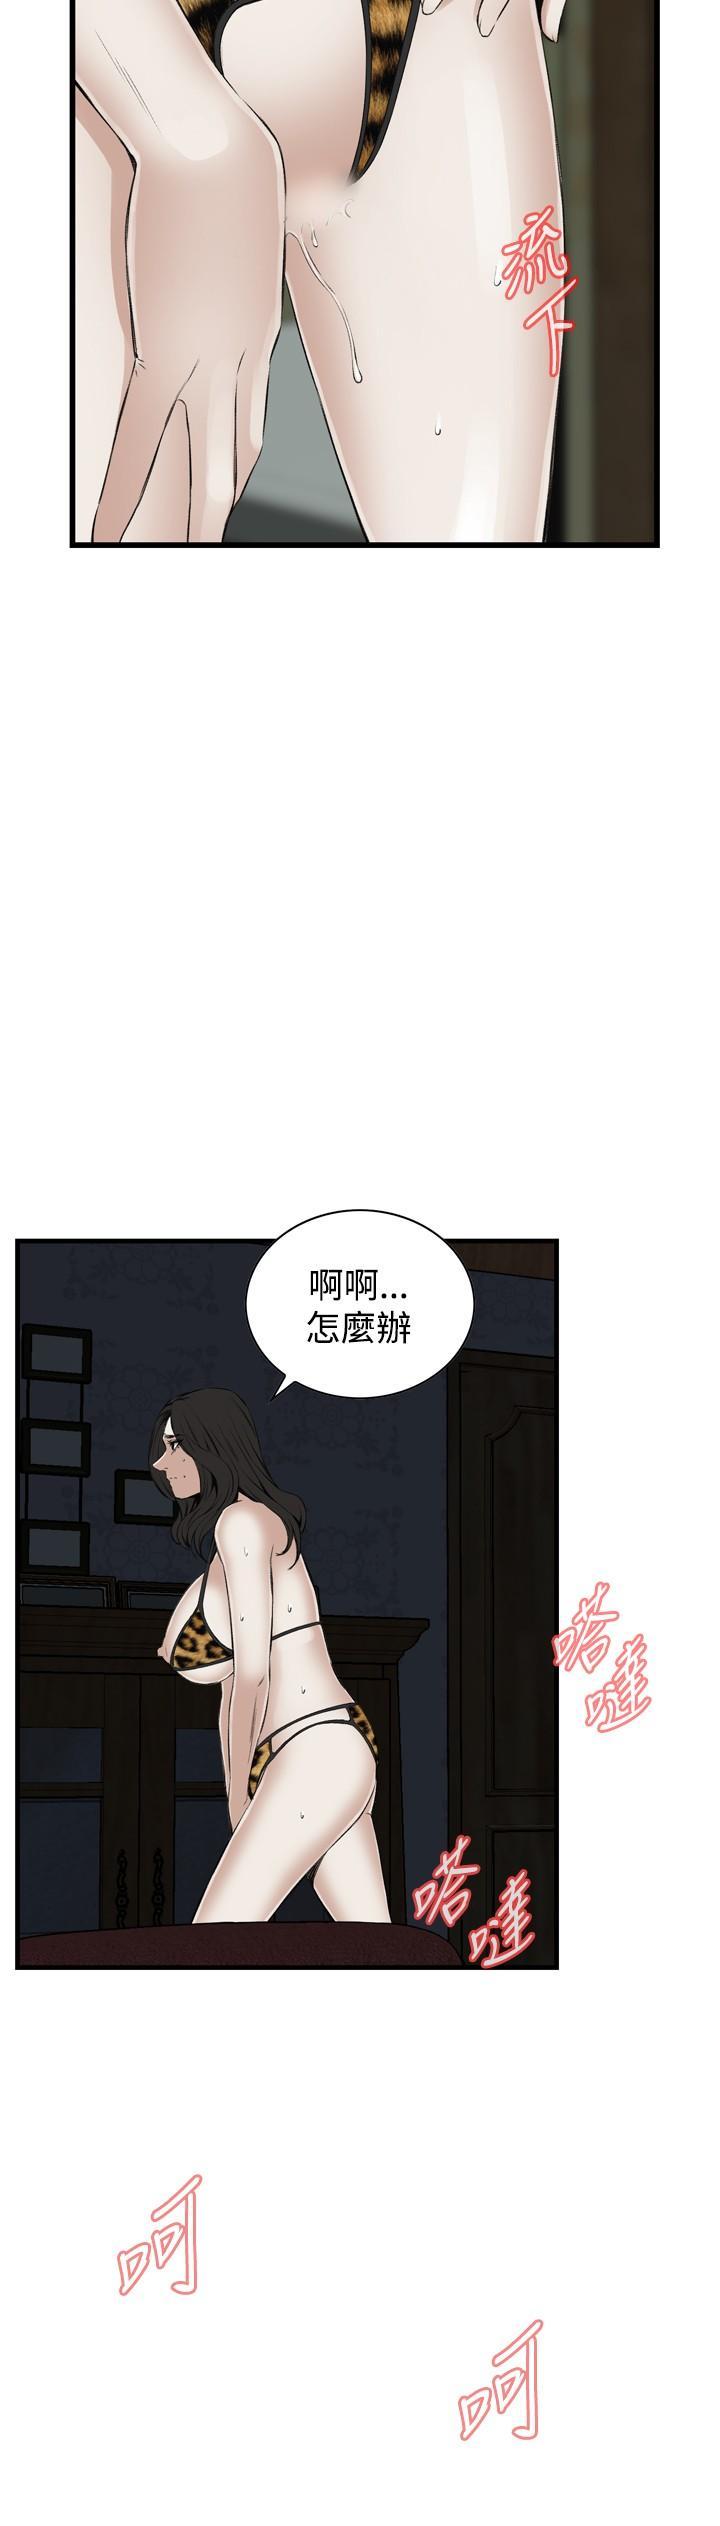 Take a Peek 偷窥 Ch.39~60 [Chinese]中文 480